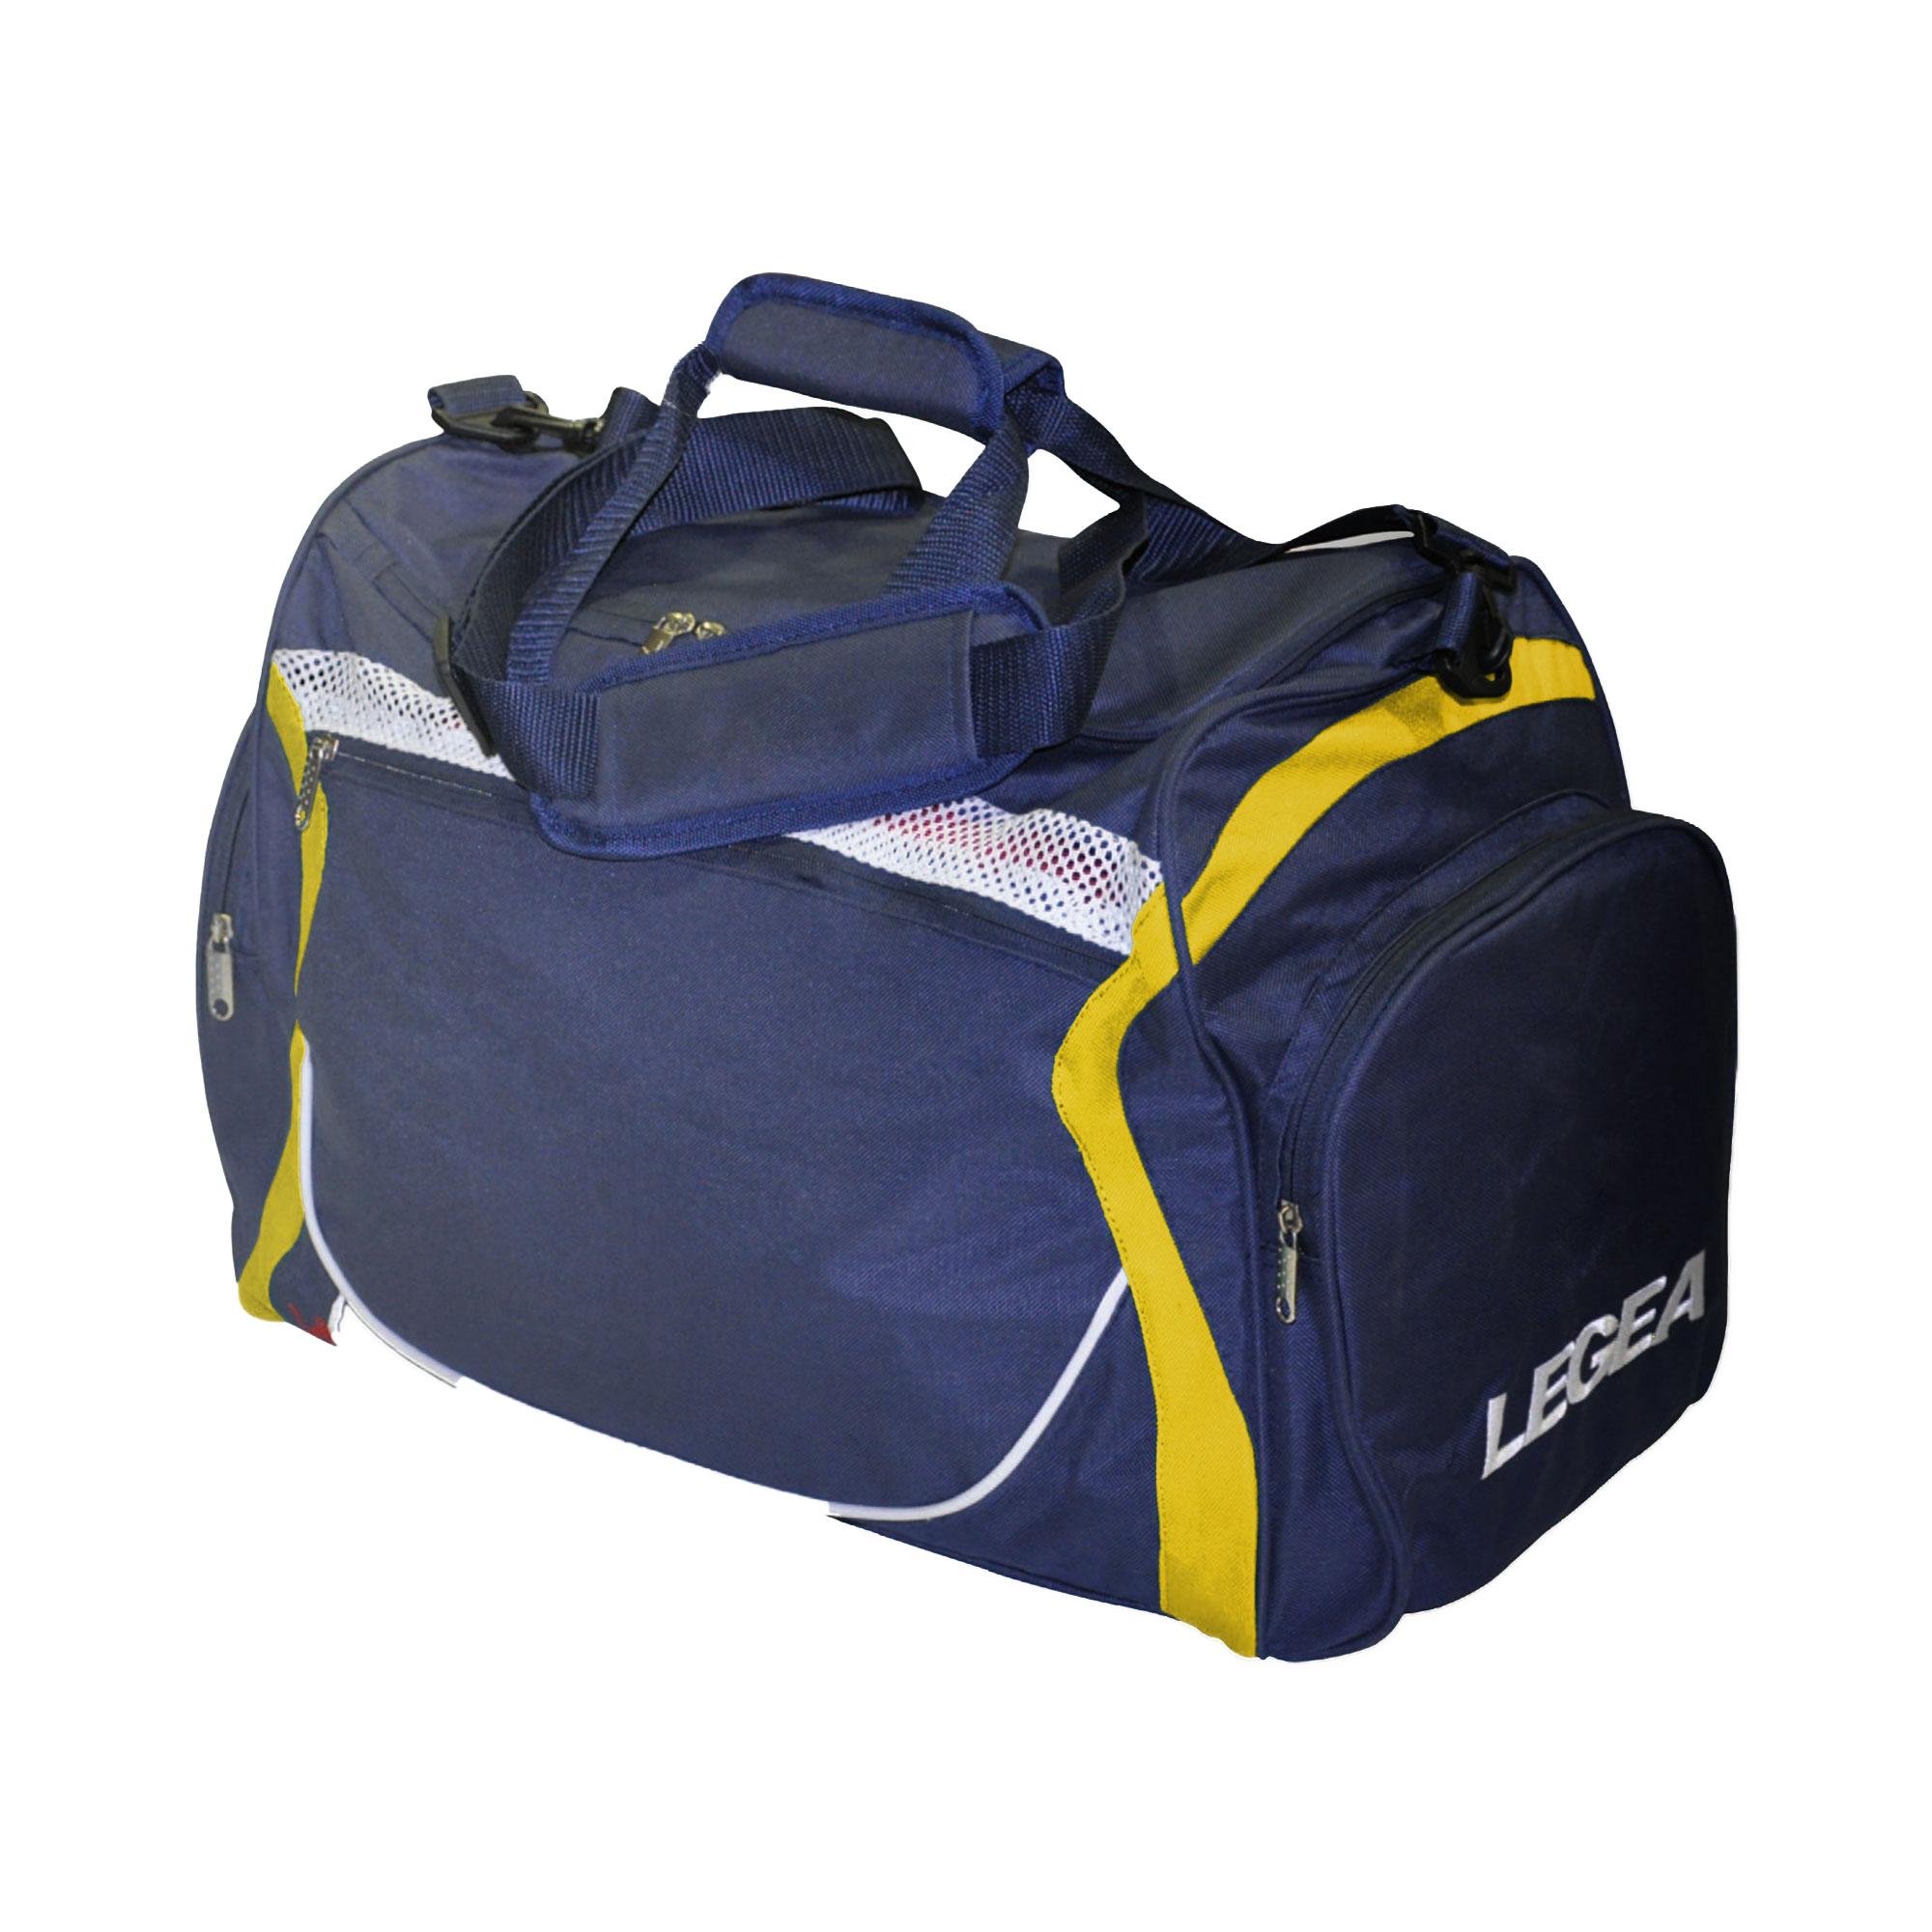 LEGEA taška Modena